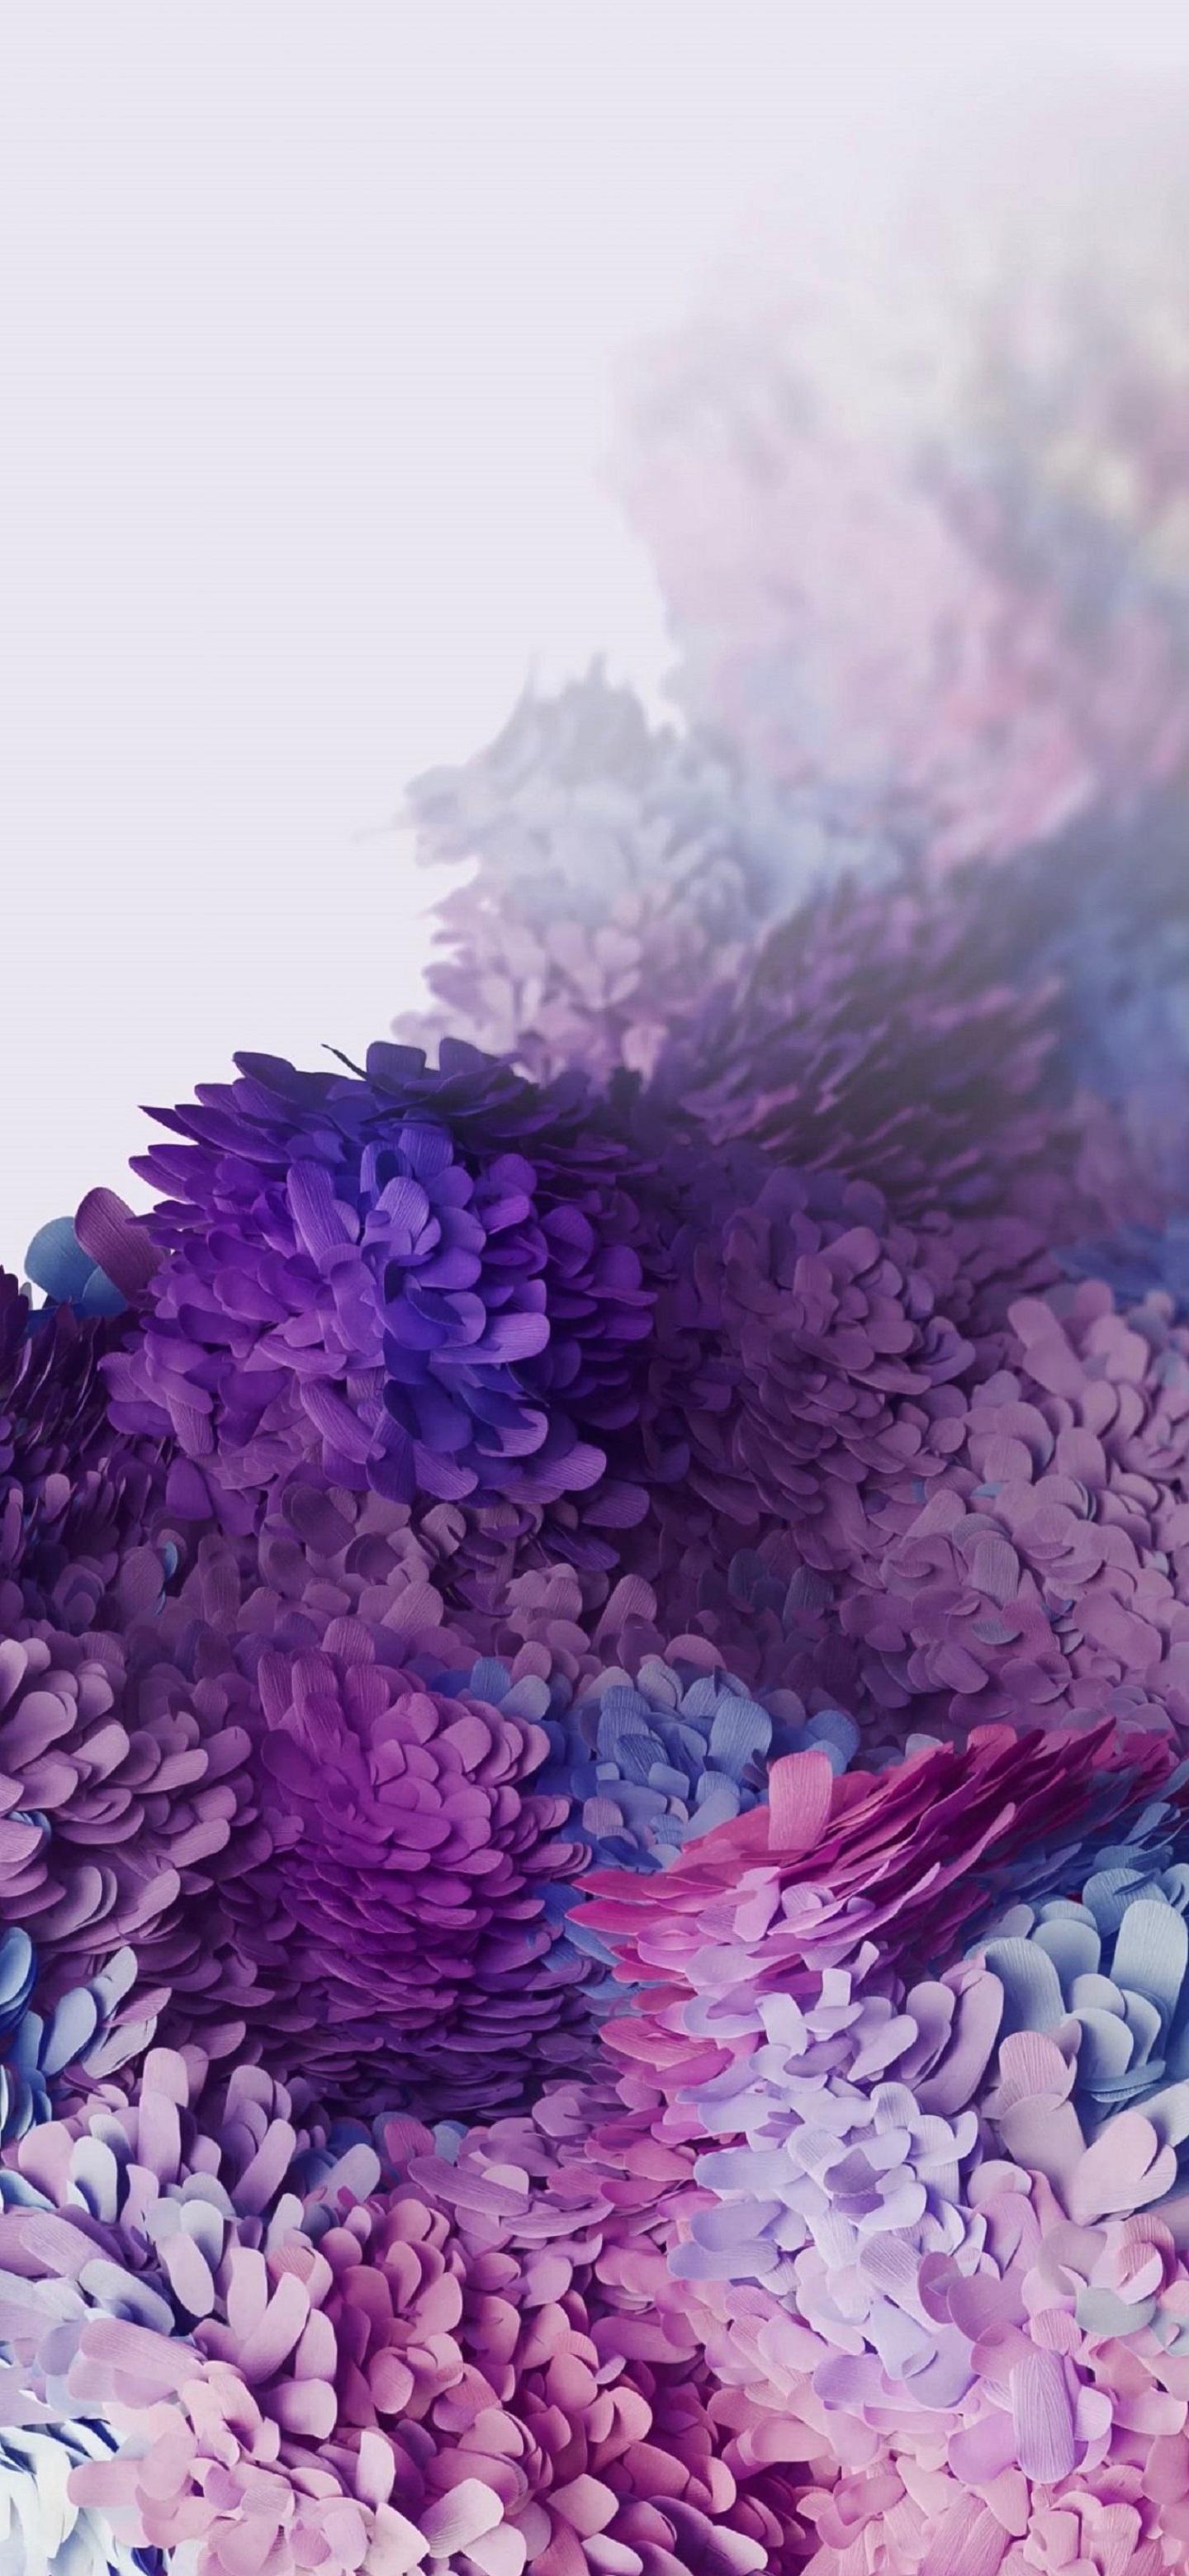 Samsung Galaxy S20 Wallpaper UseWallpaper 14 1440x3120 2190000065 1440x3120